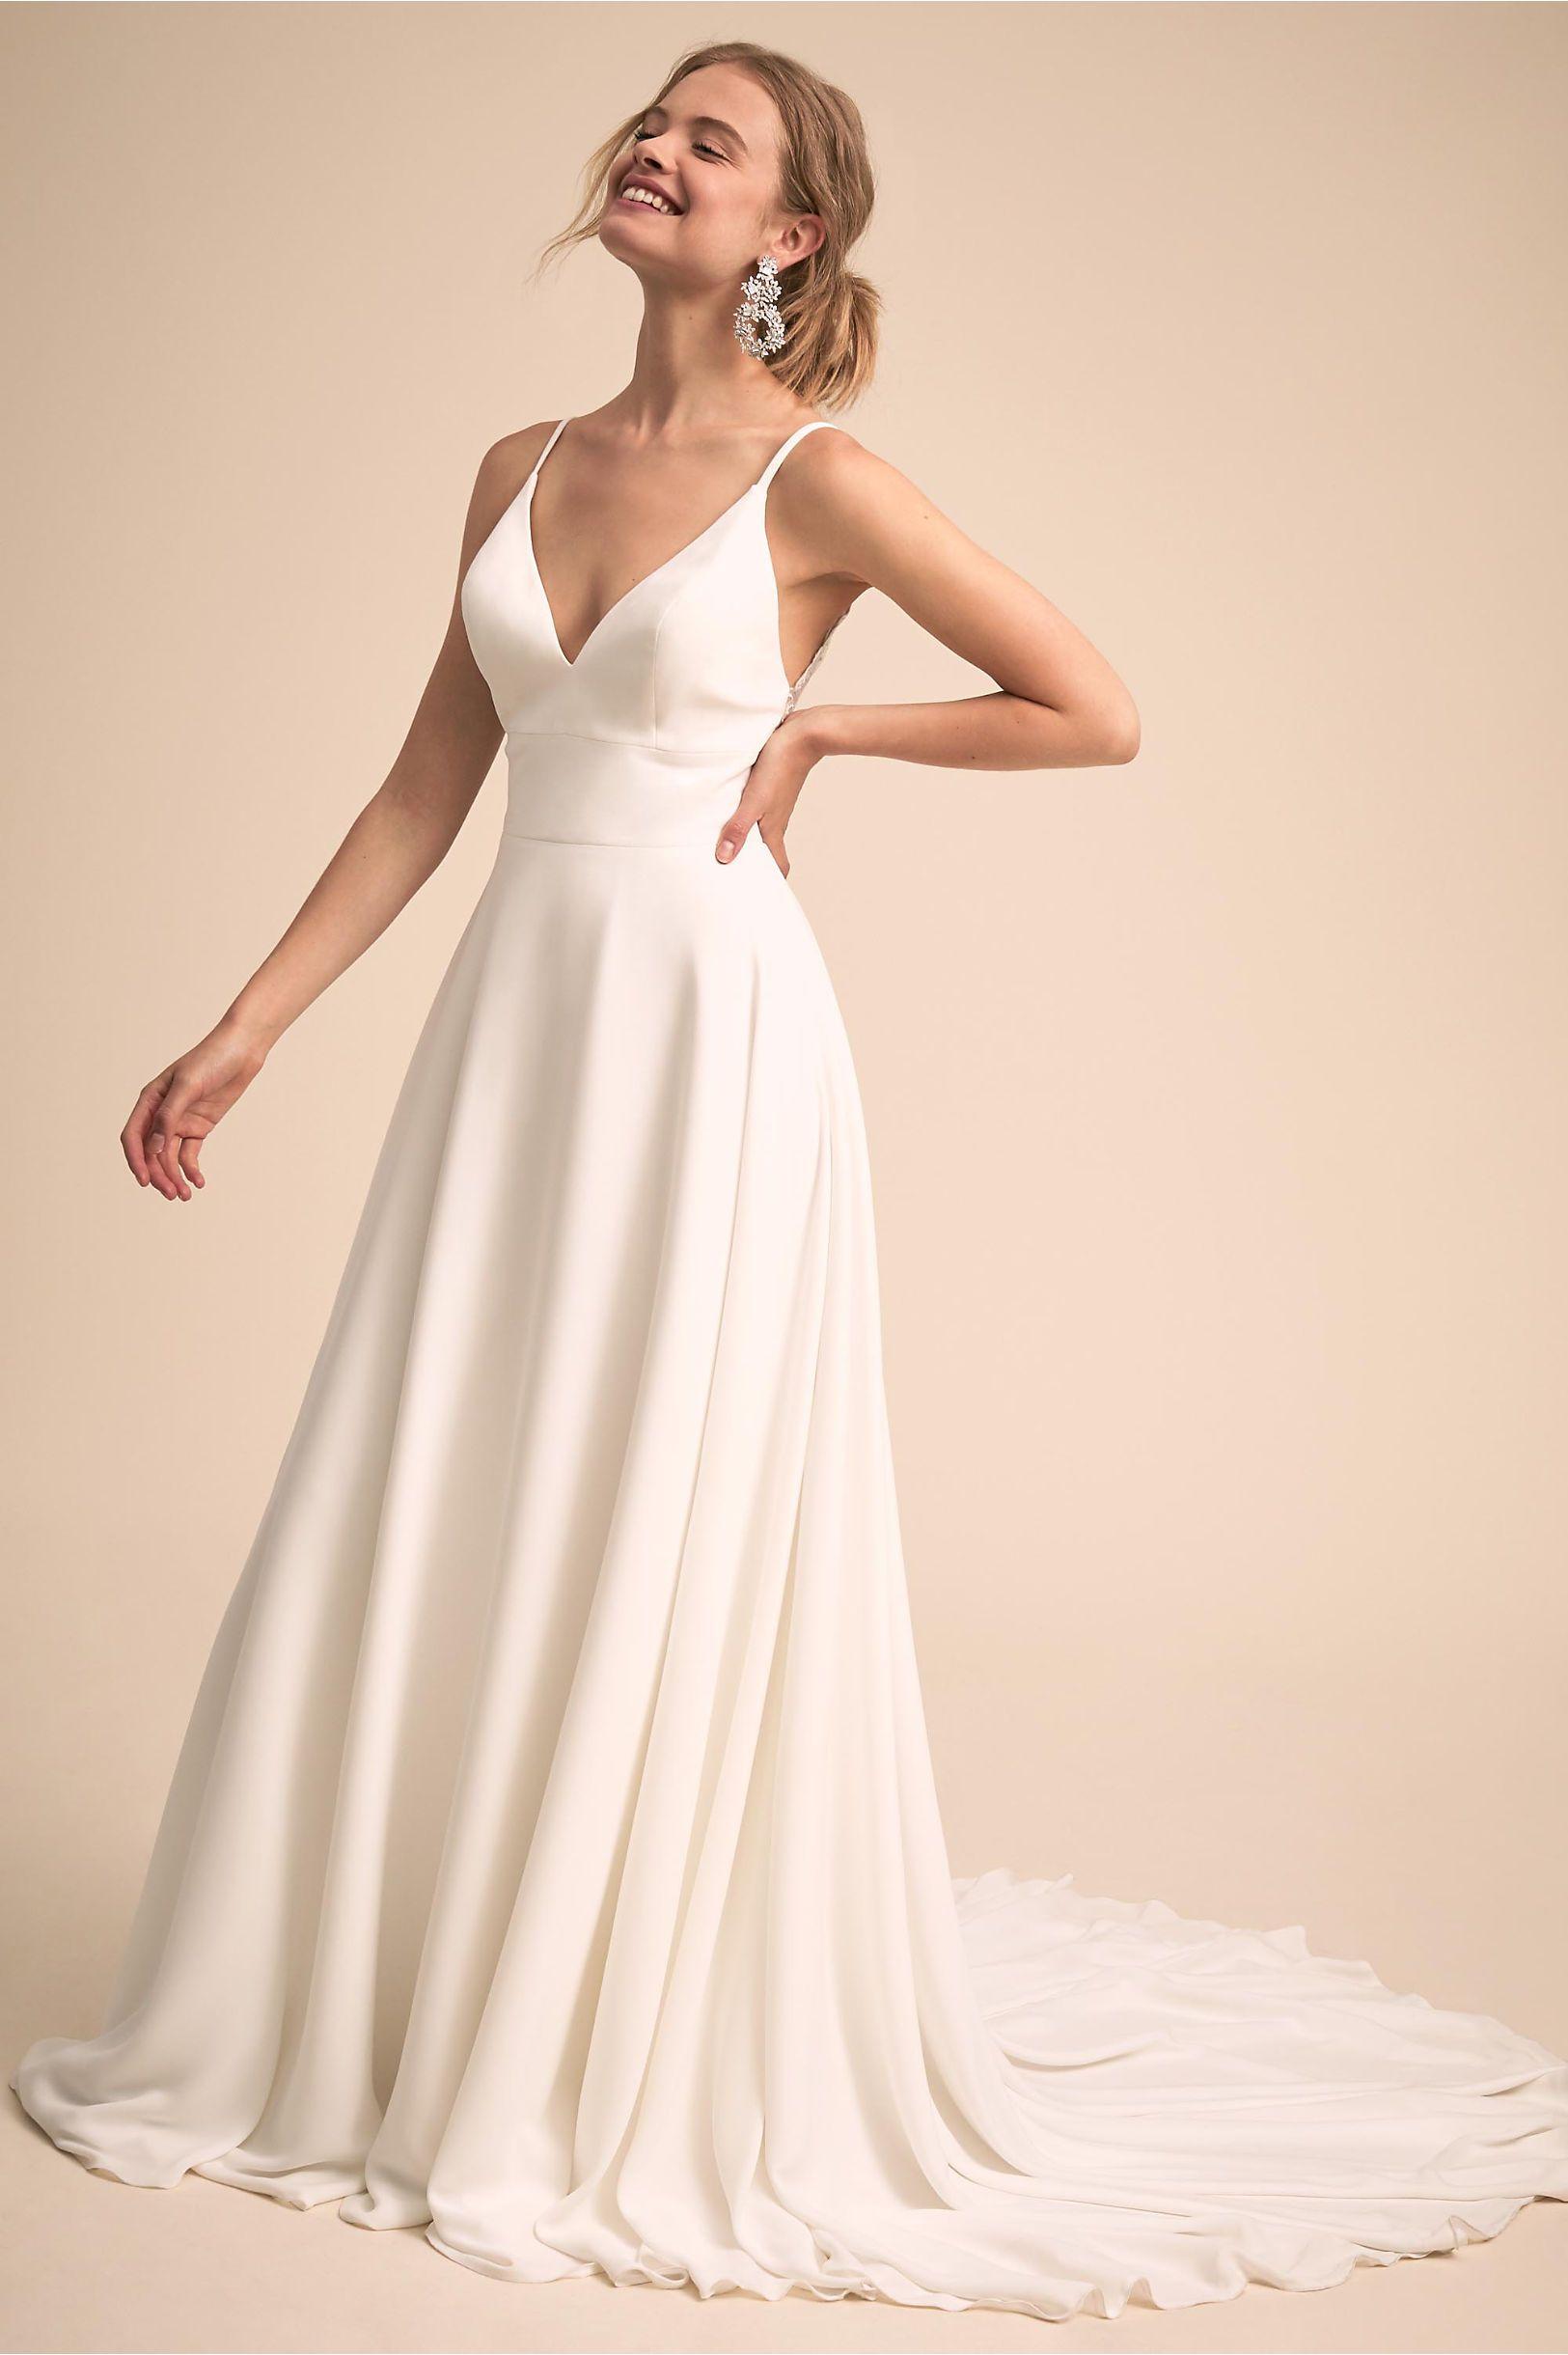 eeb113faf2568 BHLDN's Eddy K Beloved Gown in Ivory Designer Bridesmaid Dresses, Dress  Cake, Amazing Wedding